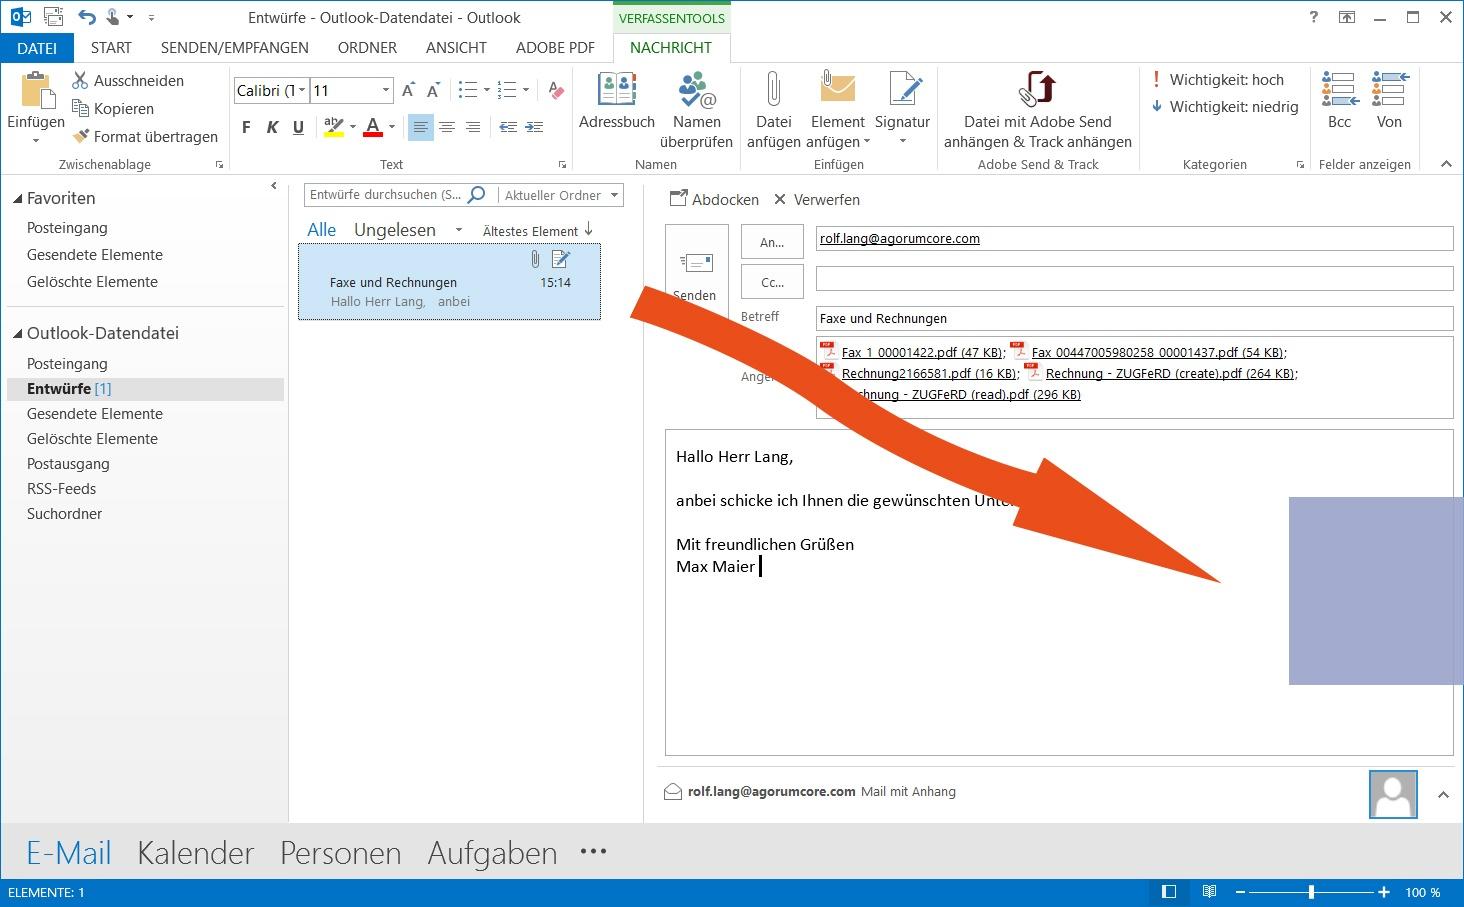 Schön Coole Outlook Signaturvorlagen Fotos - Entry Level Resume ...